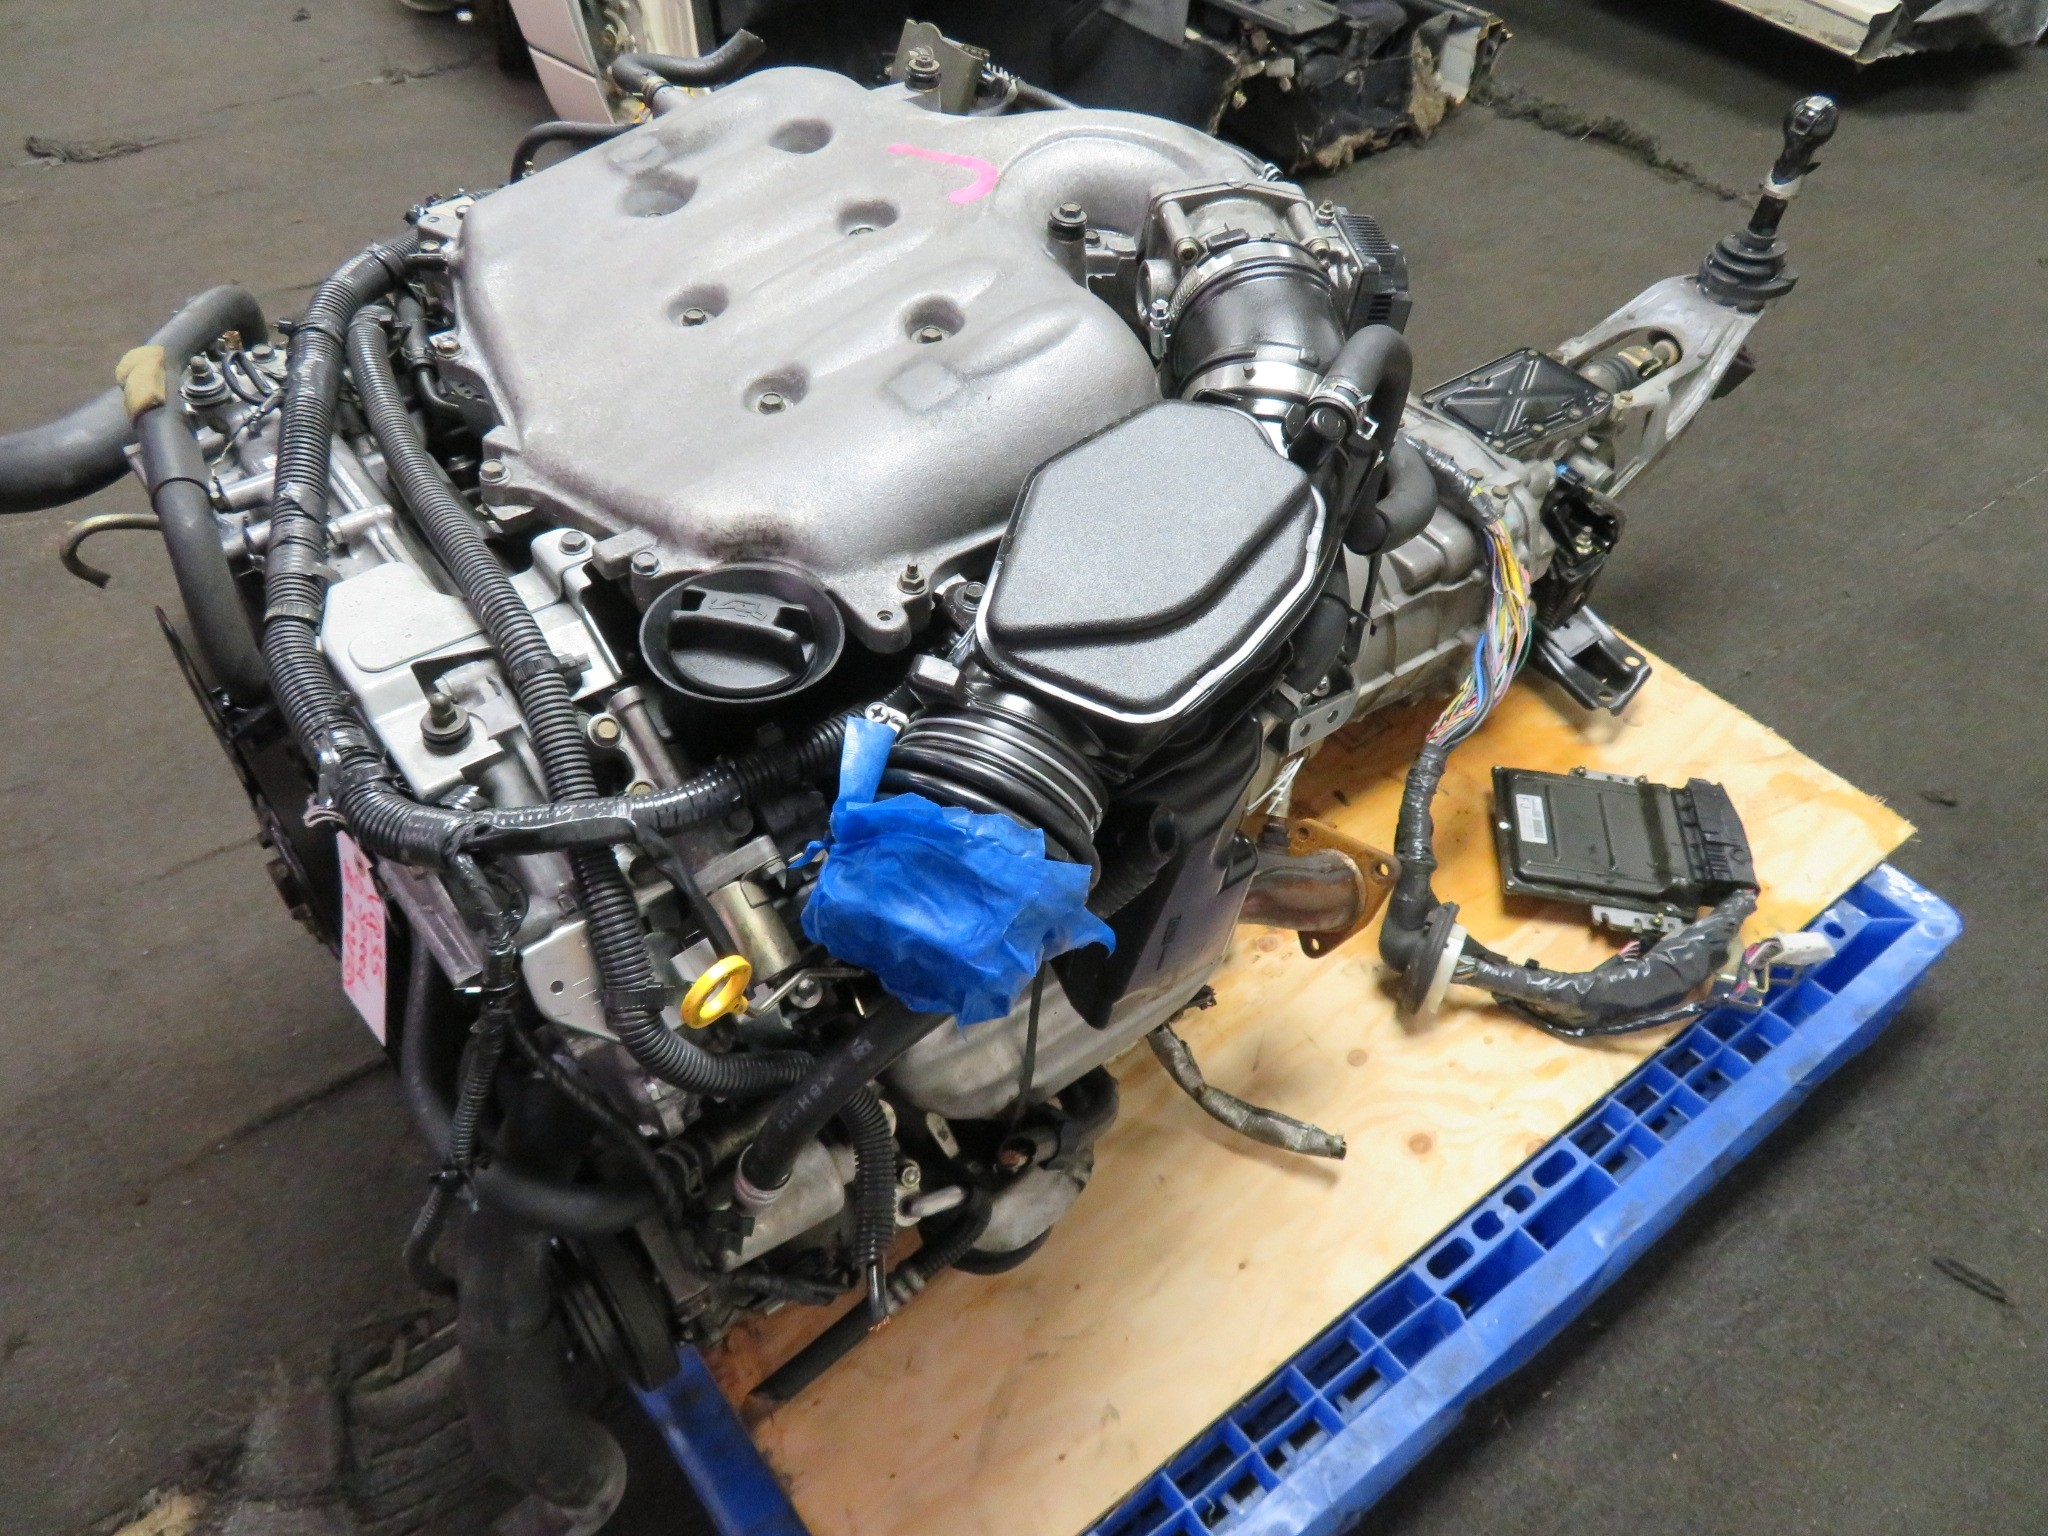 2003-2005 JDM NISSAN 350Z INFINITI G35 VQ35DE 3.5L V6 ENGINE, 6 SPEED TRANSMISSION, WIRING HARNESS, ECU